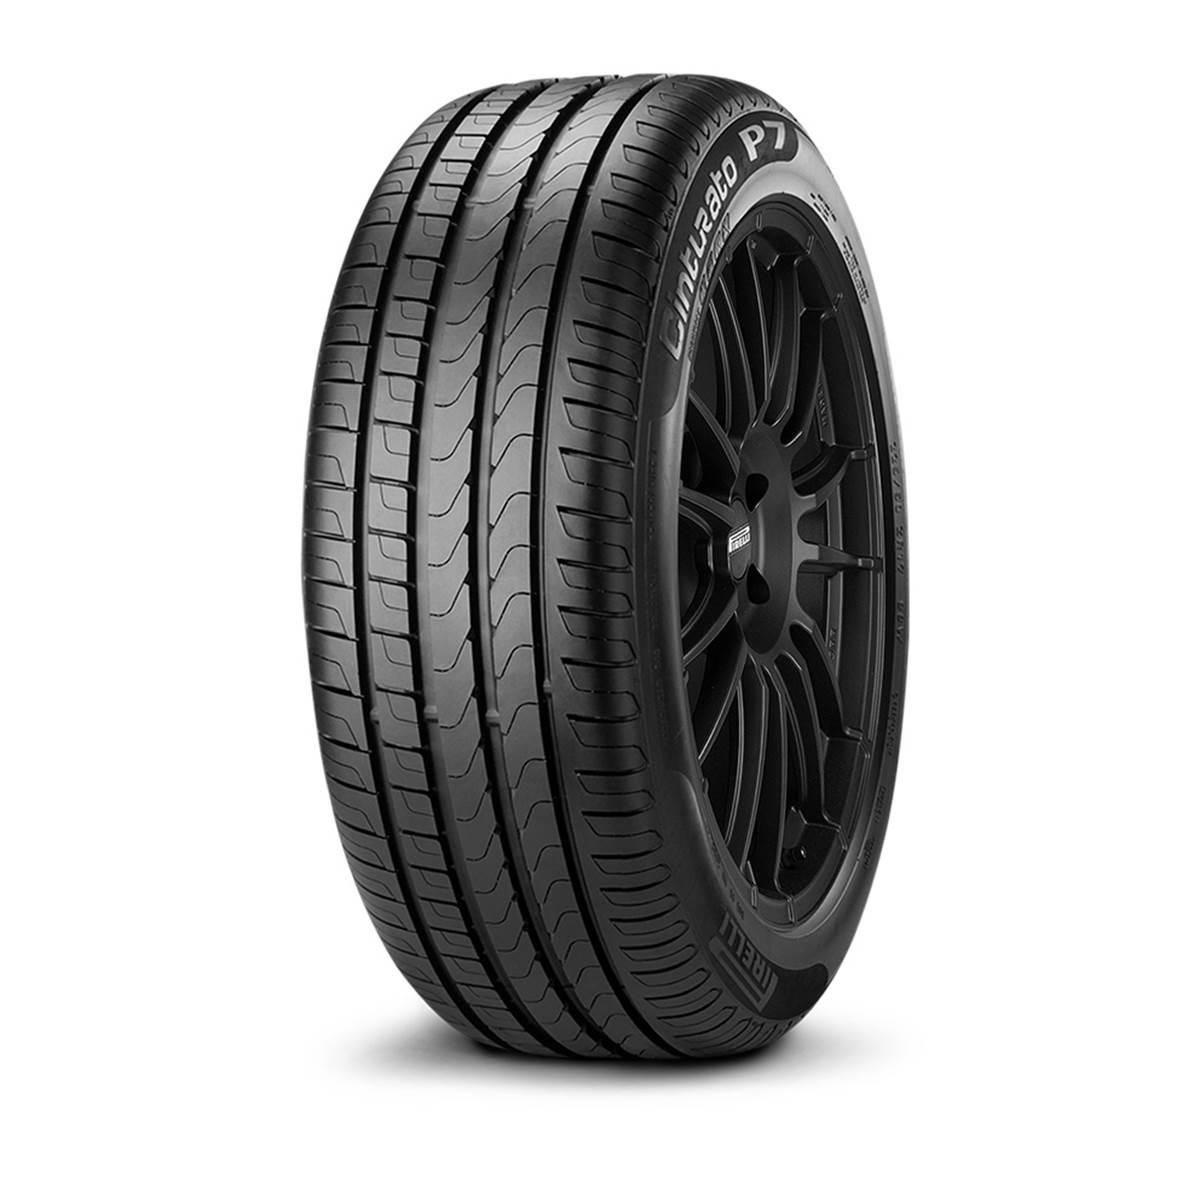 Pneu Pirelli 225/55R16 95W Cinturato P7